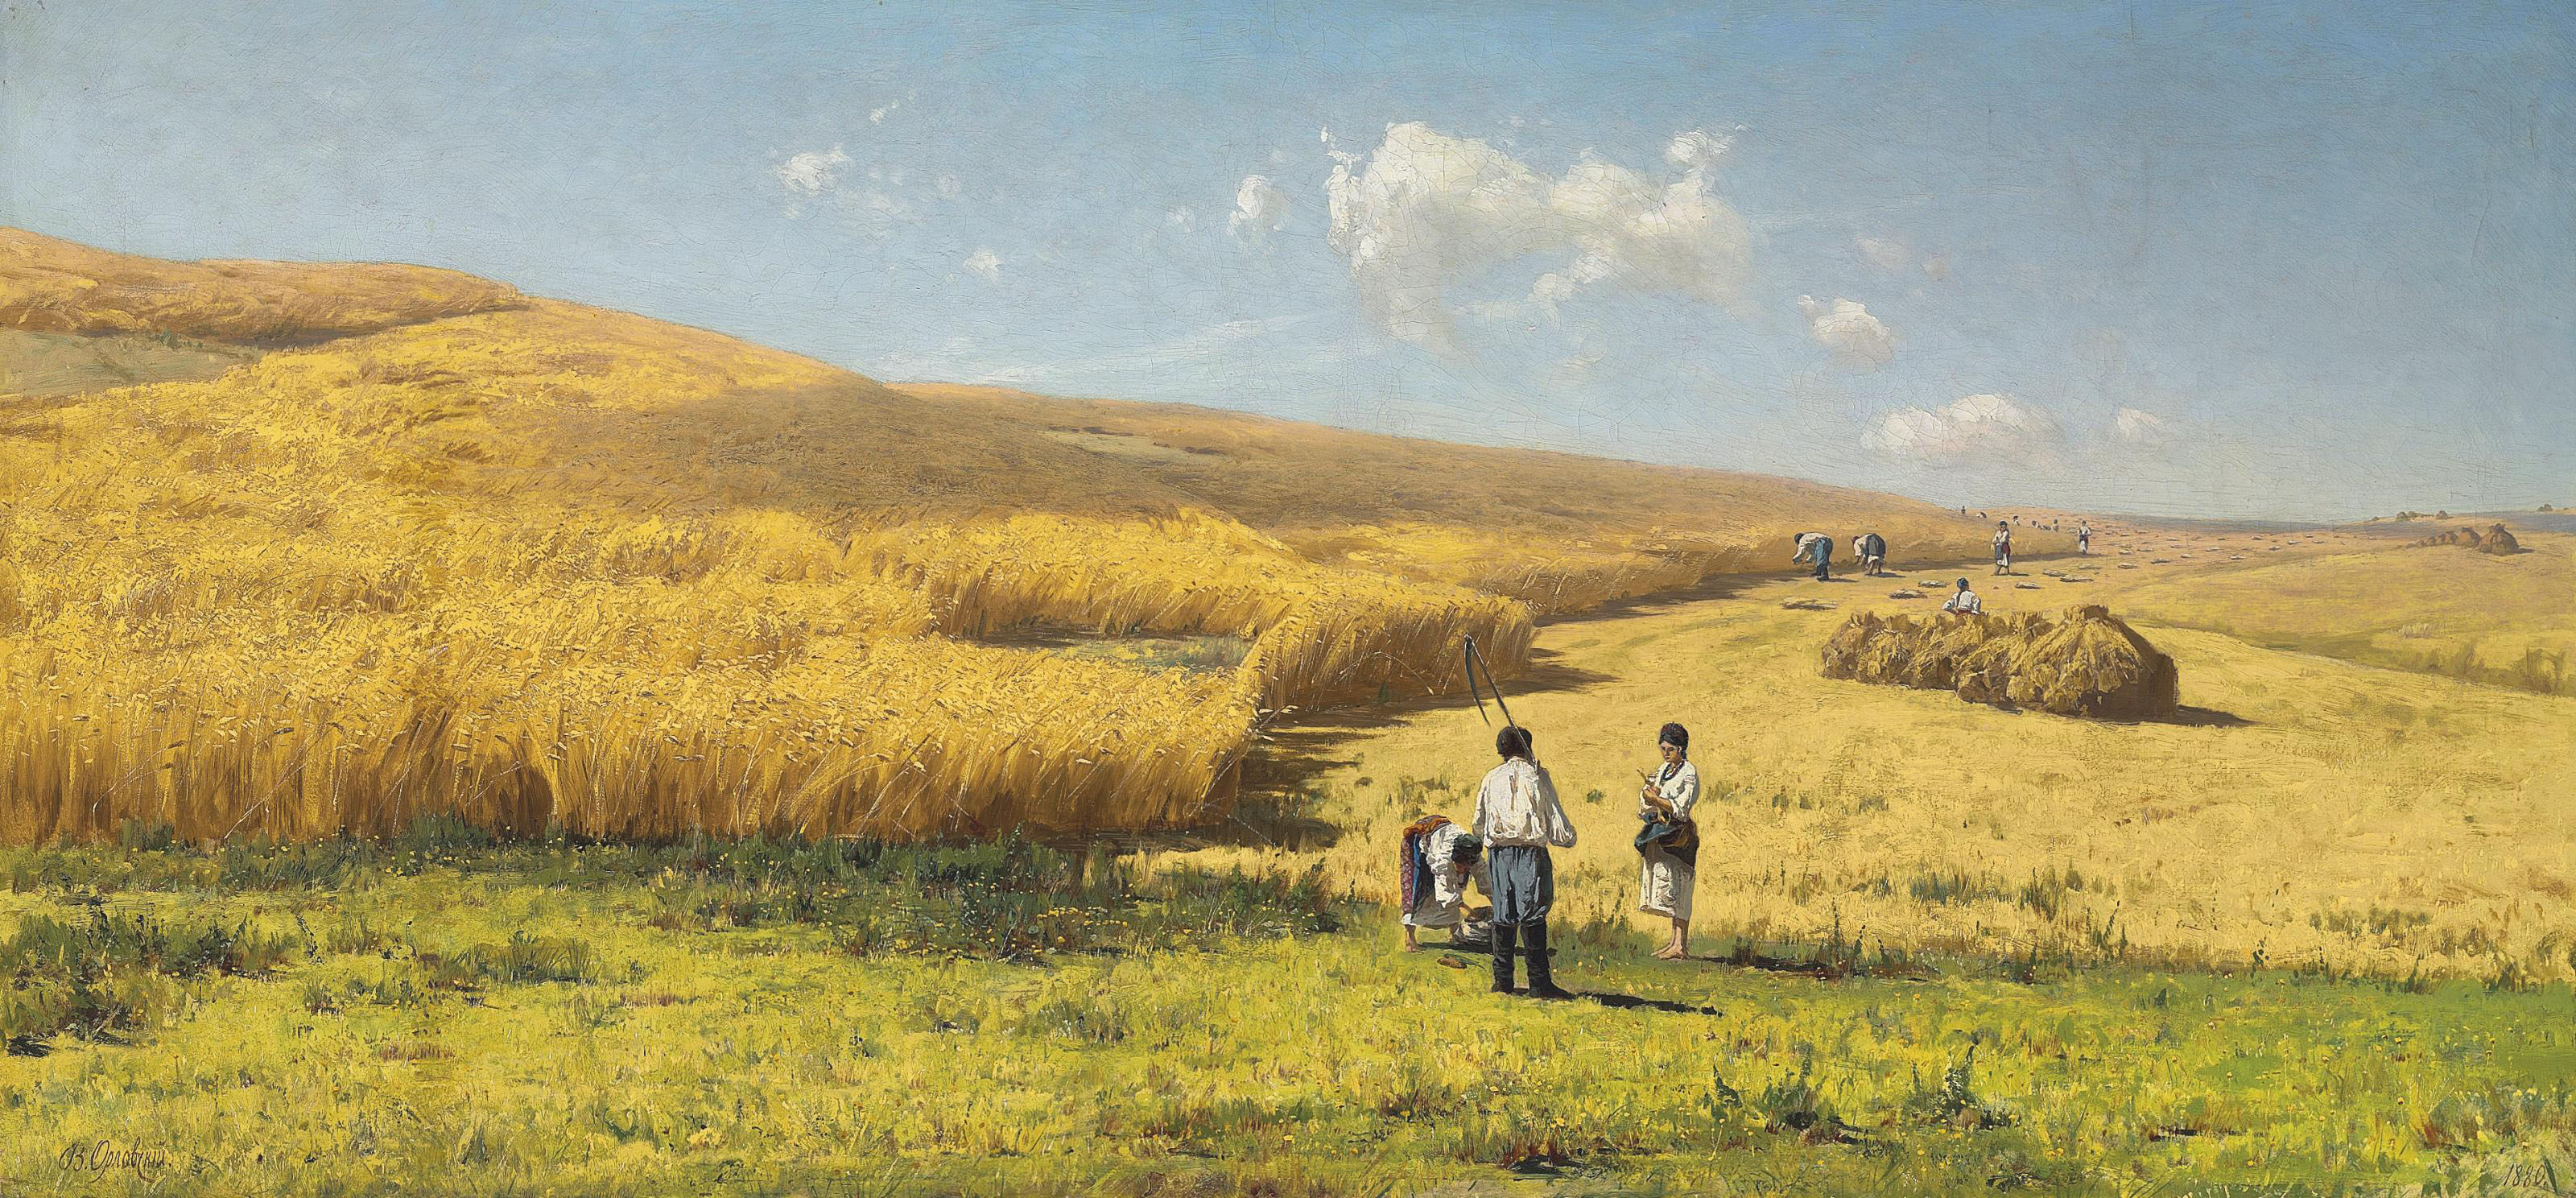 Harvest in the Ukraine